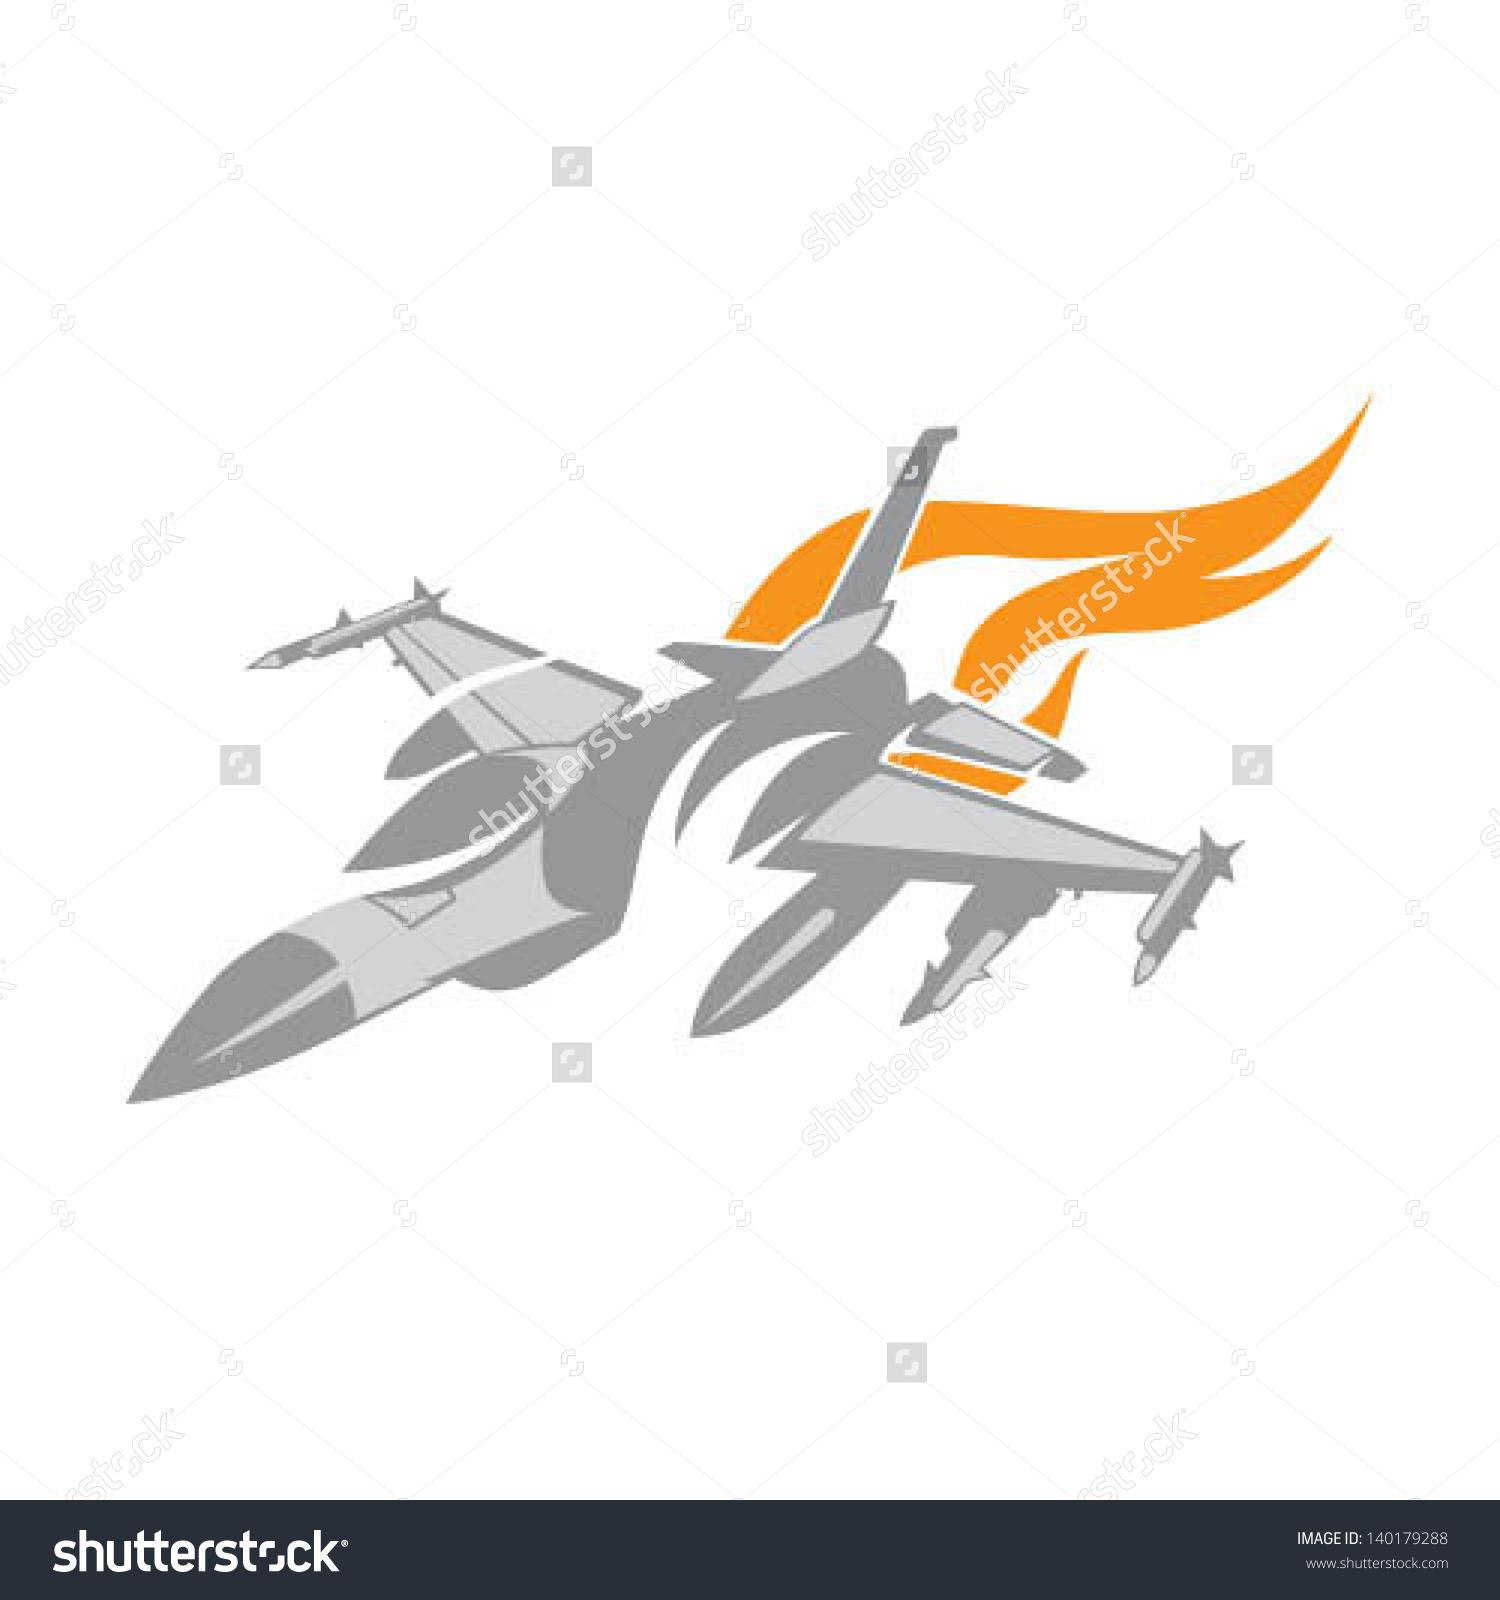 Fighter Jet Stylized Stock Vector 140179288.